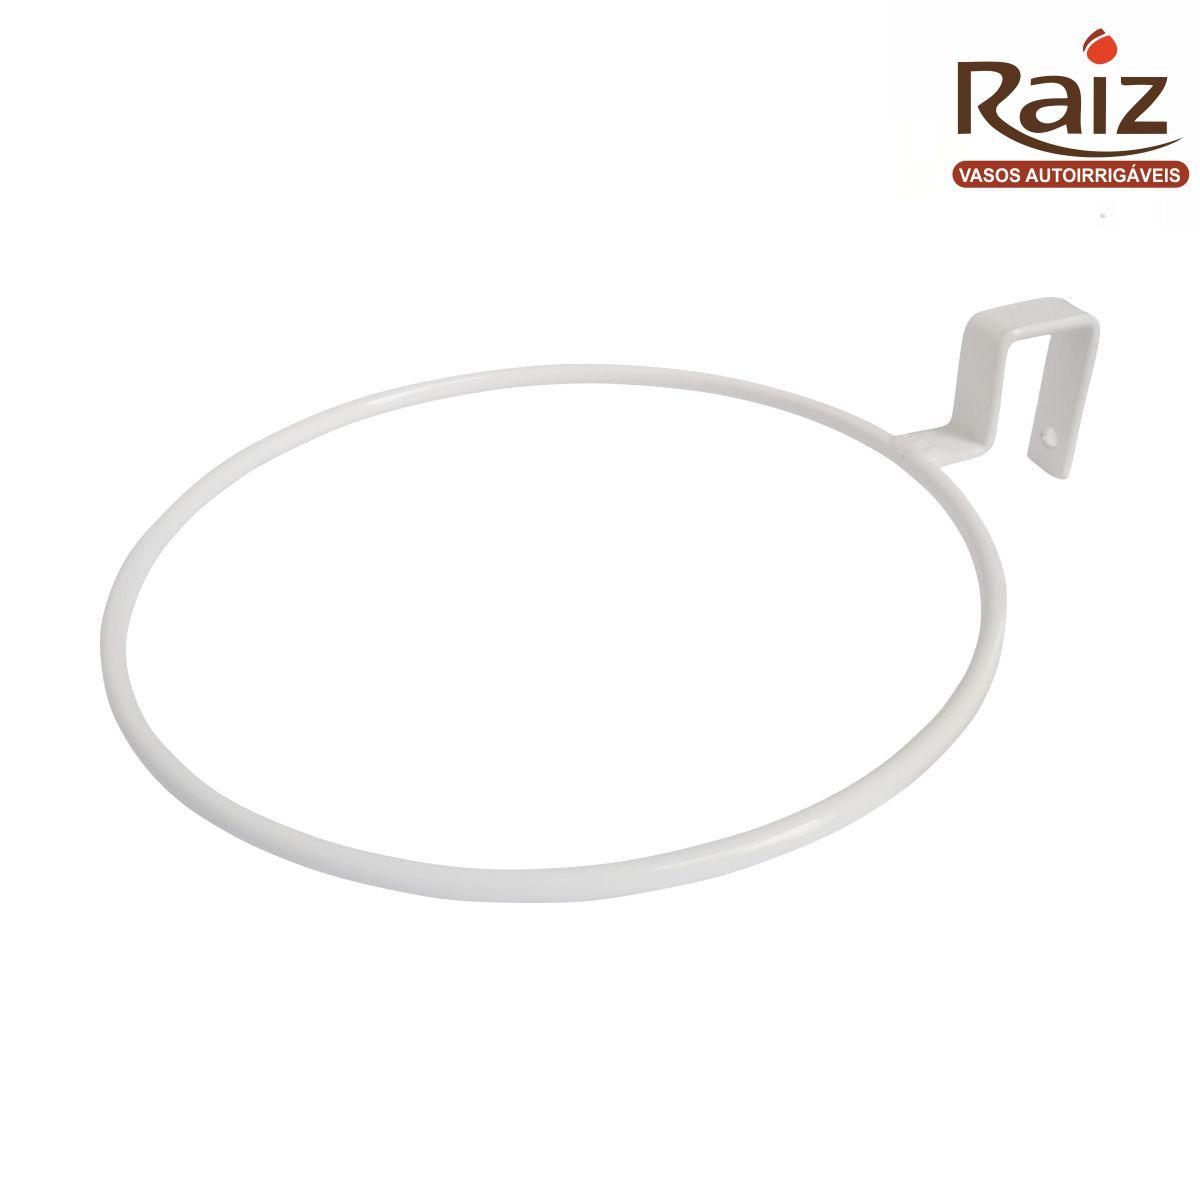 Suporte de Treliça Branco para Vaso Autoirrigável Grande RAIZ